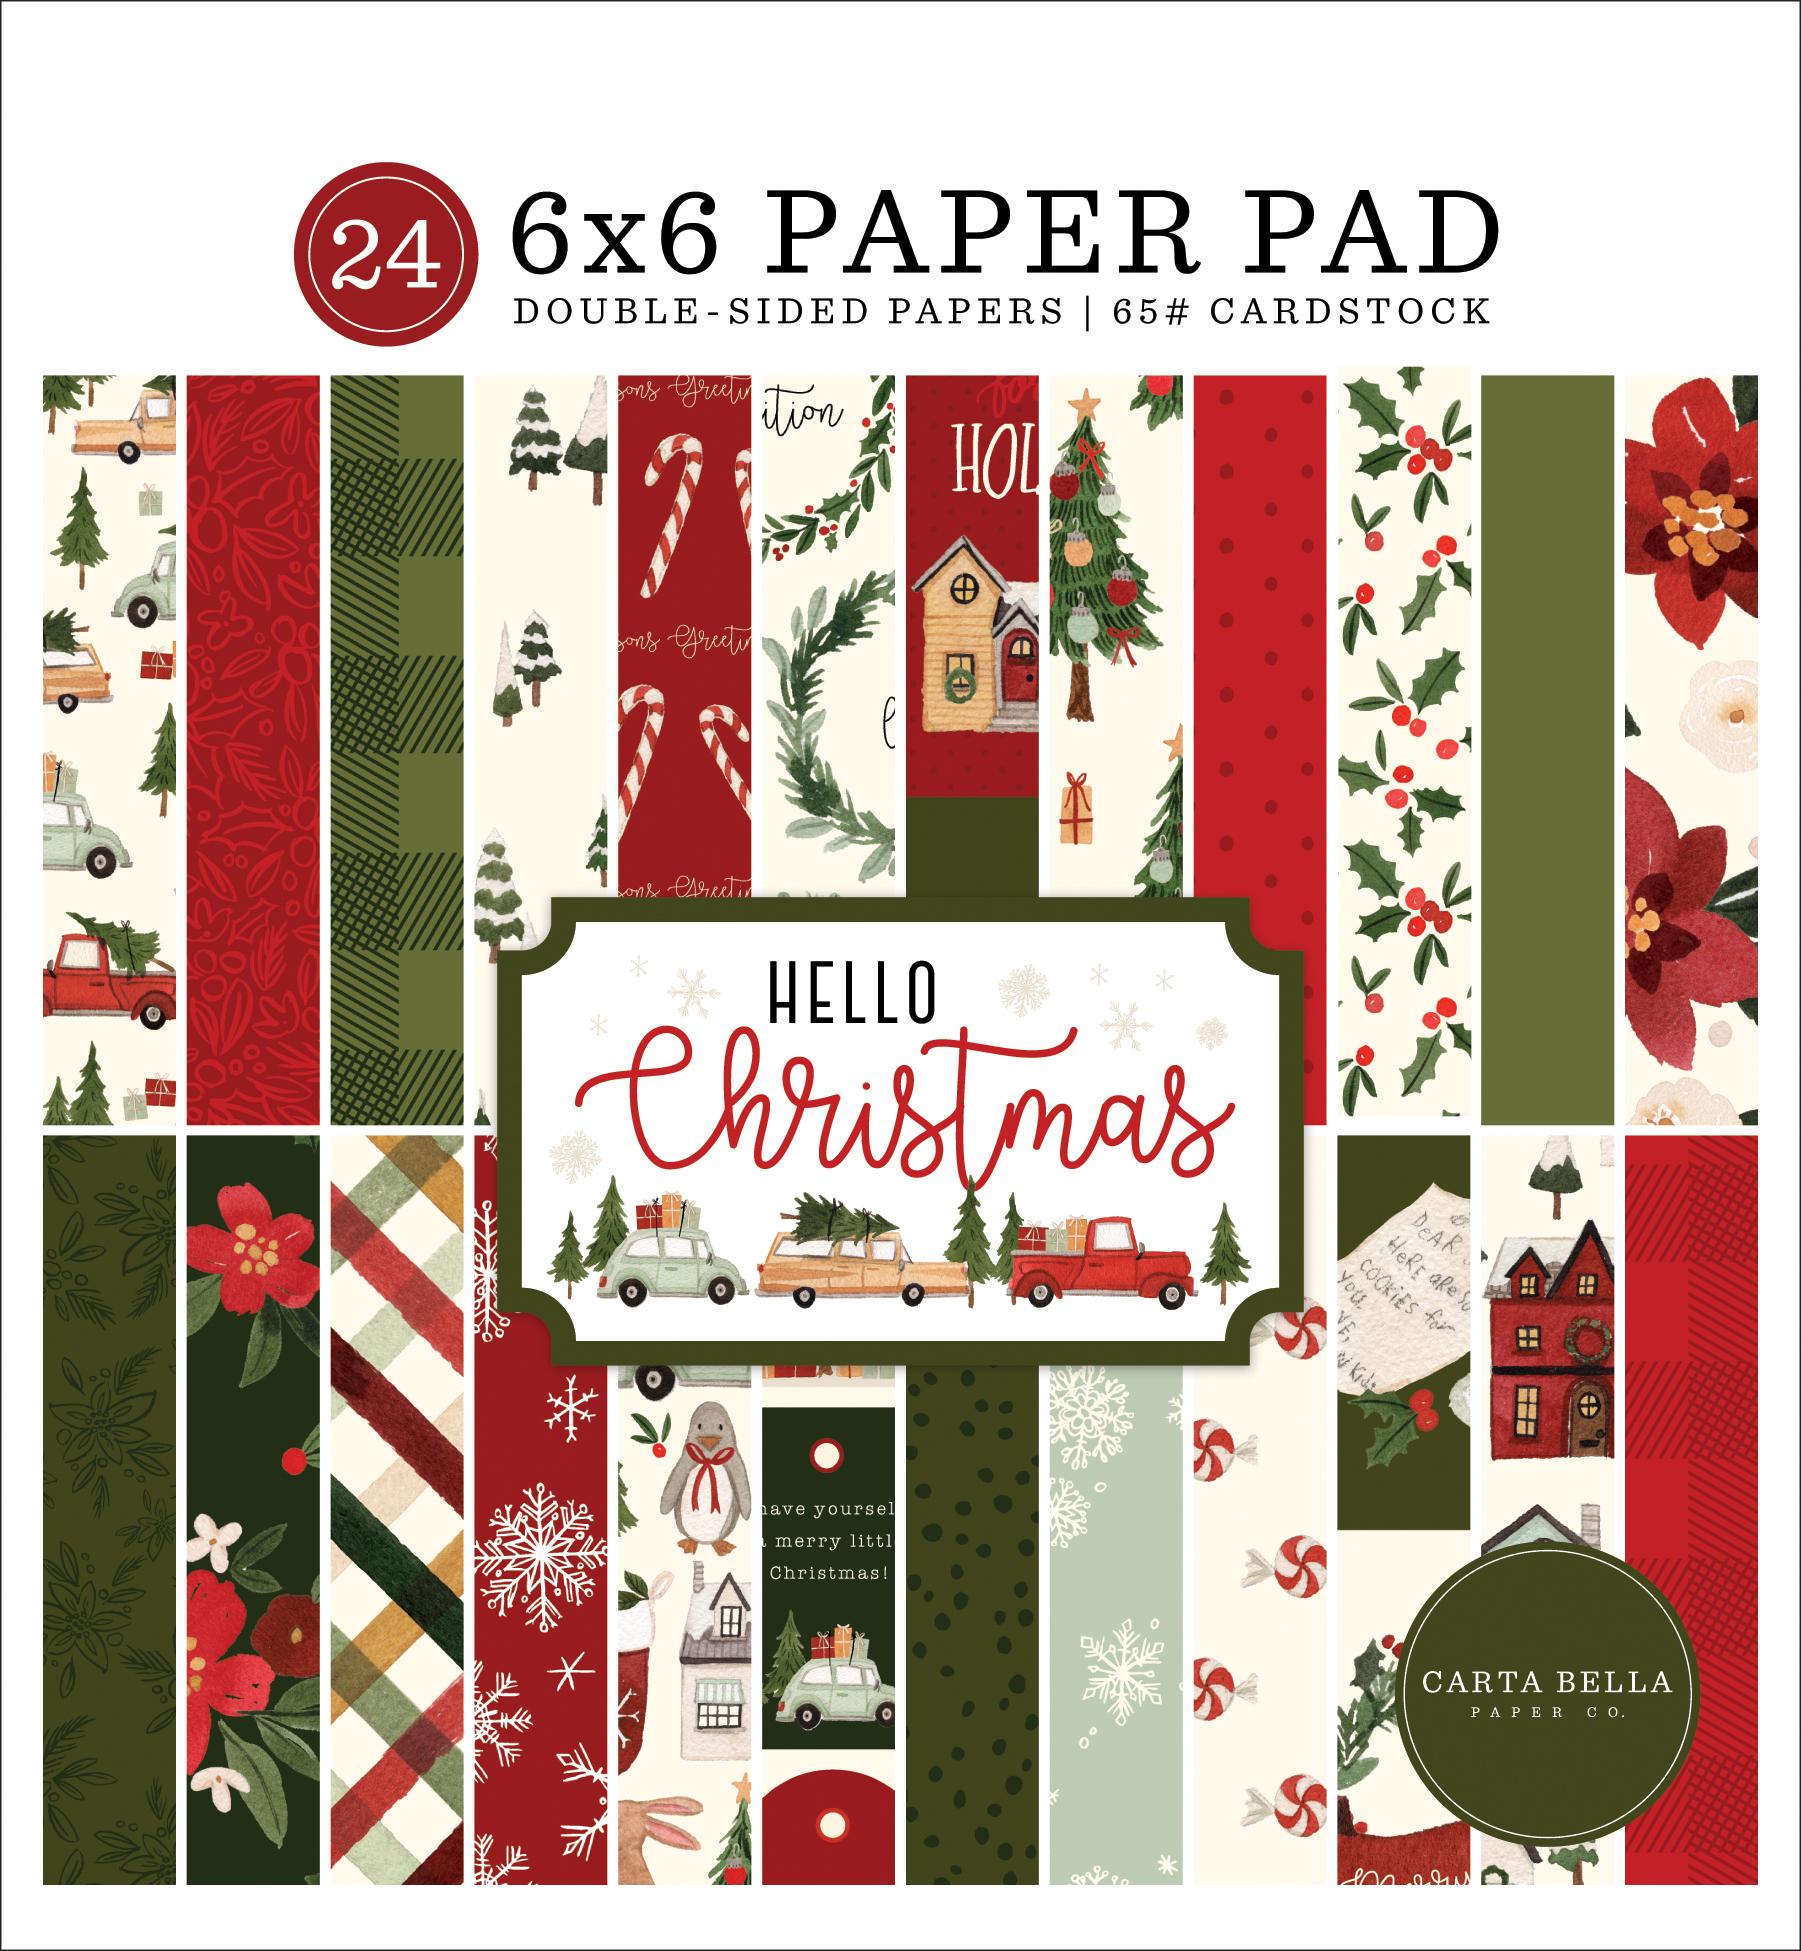 Hello Christmas 6x6 Paper Pad